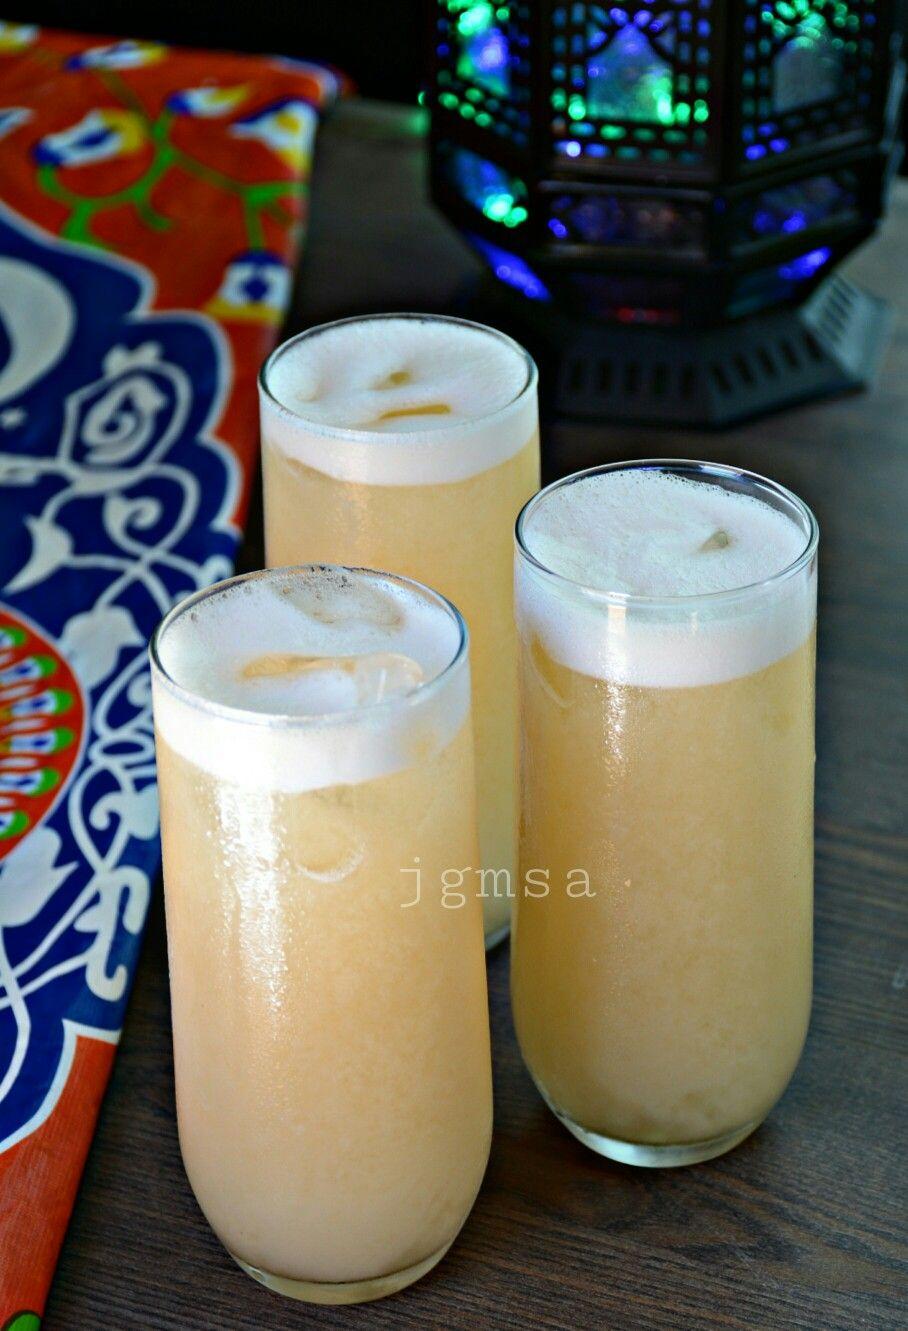 Pin By Ran On رمضان 2022 Desserts Food Glass Of Milk